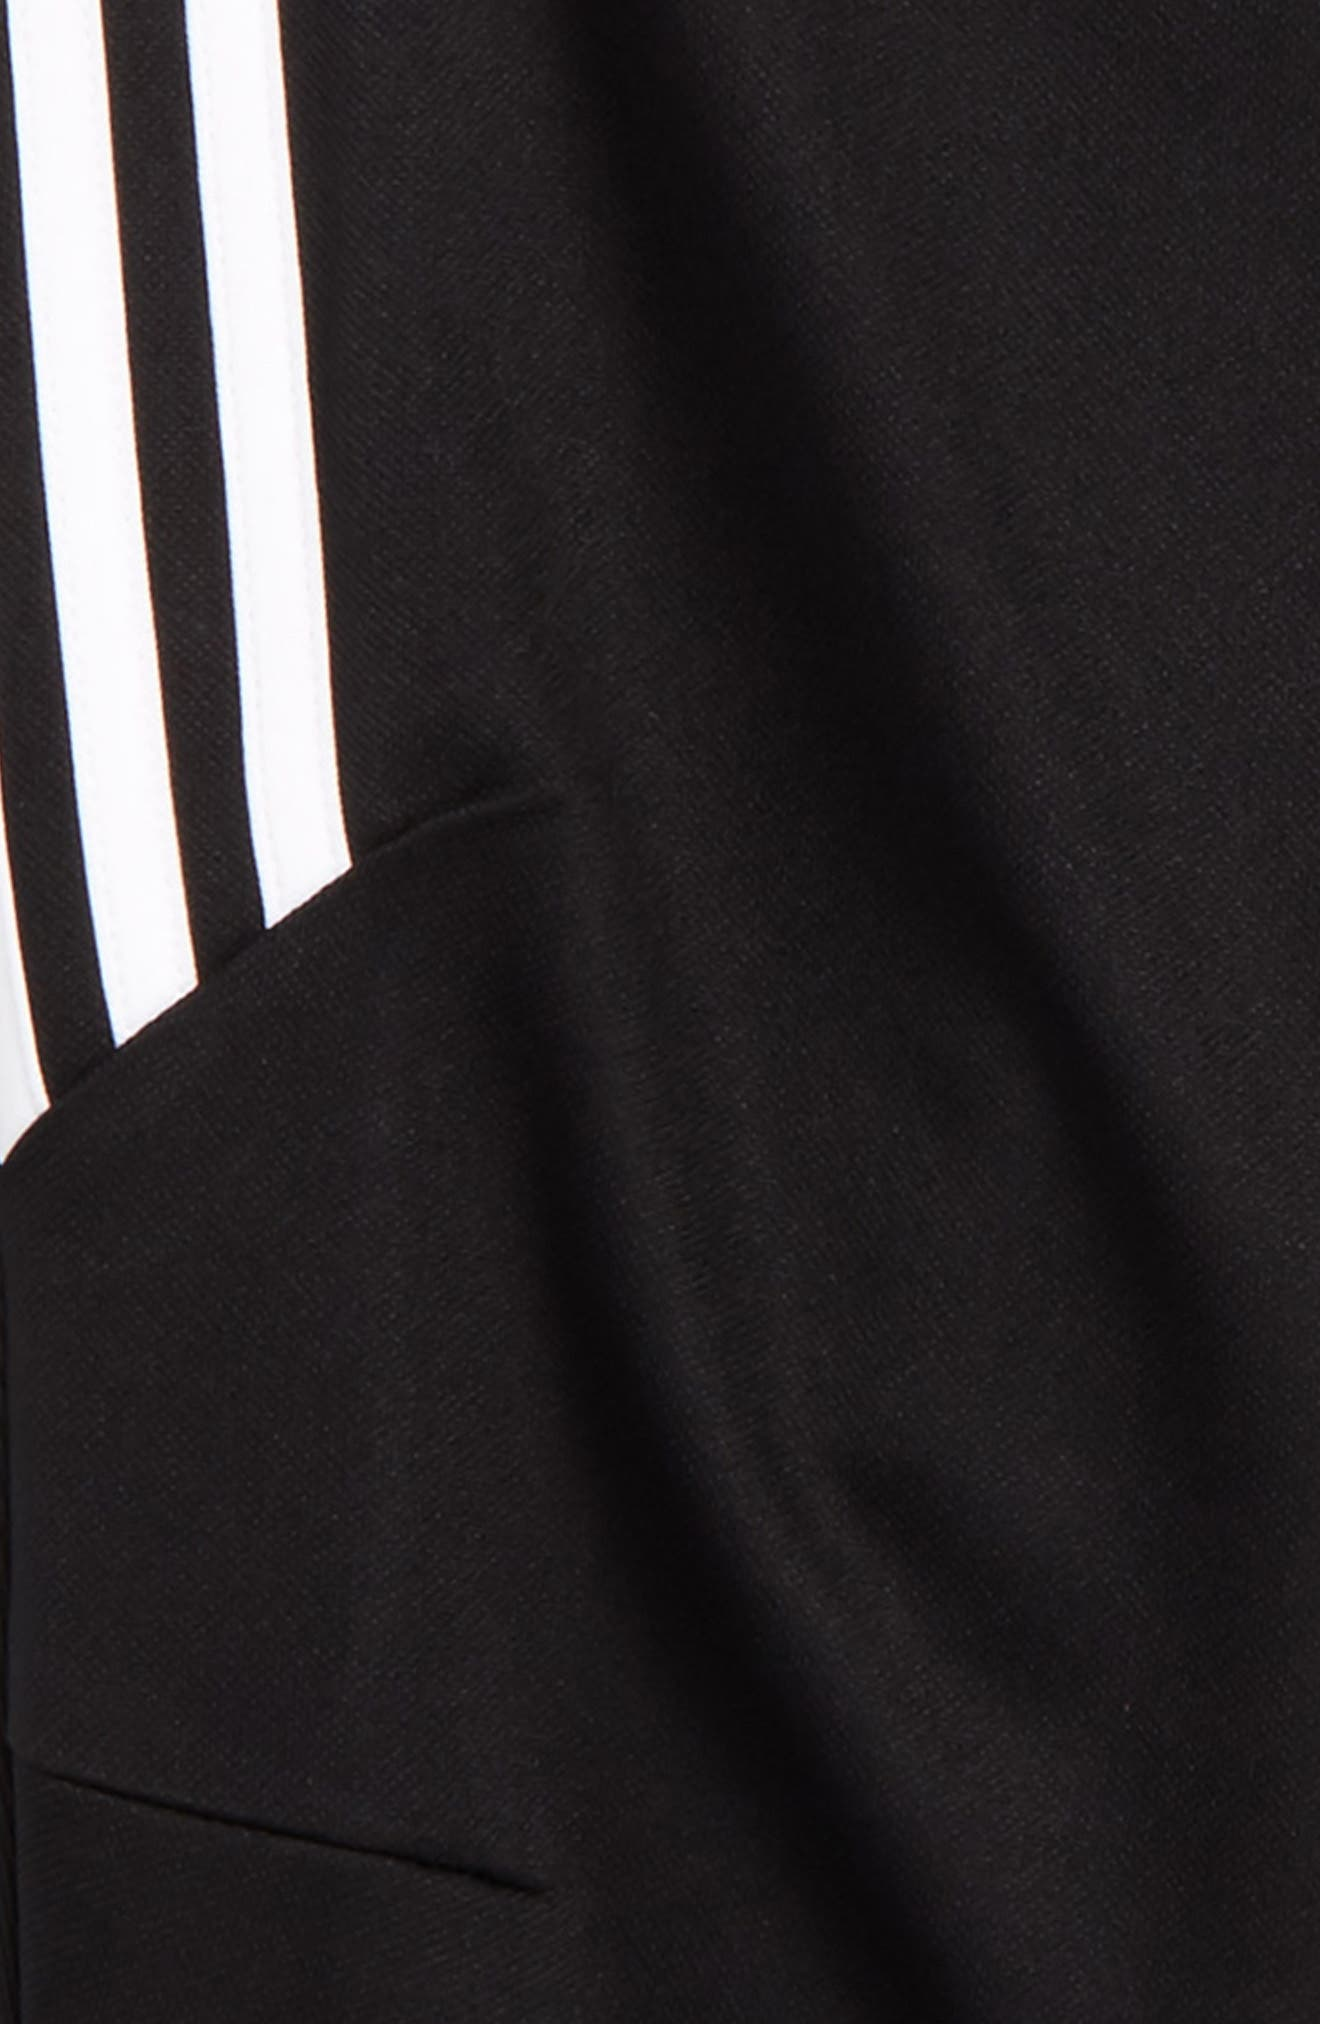 ADIDAS ORIGINALS, Tiro 17 Training Pants, Alternate thumbnail 2, color, BLACK/ WHITE/ WHITE